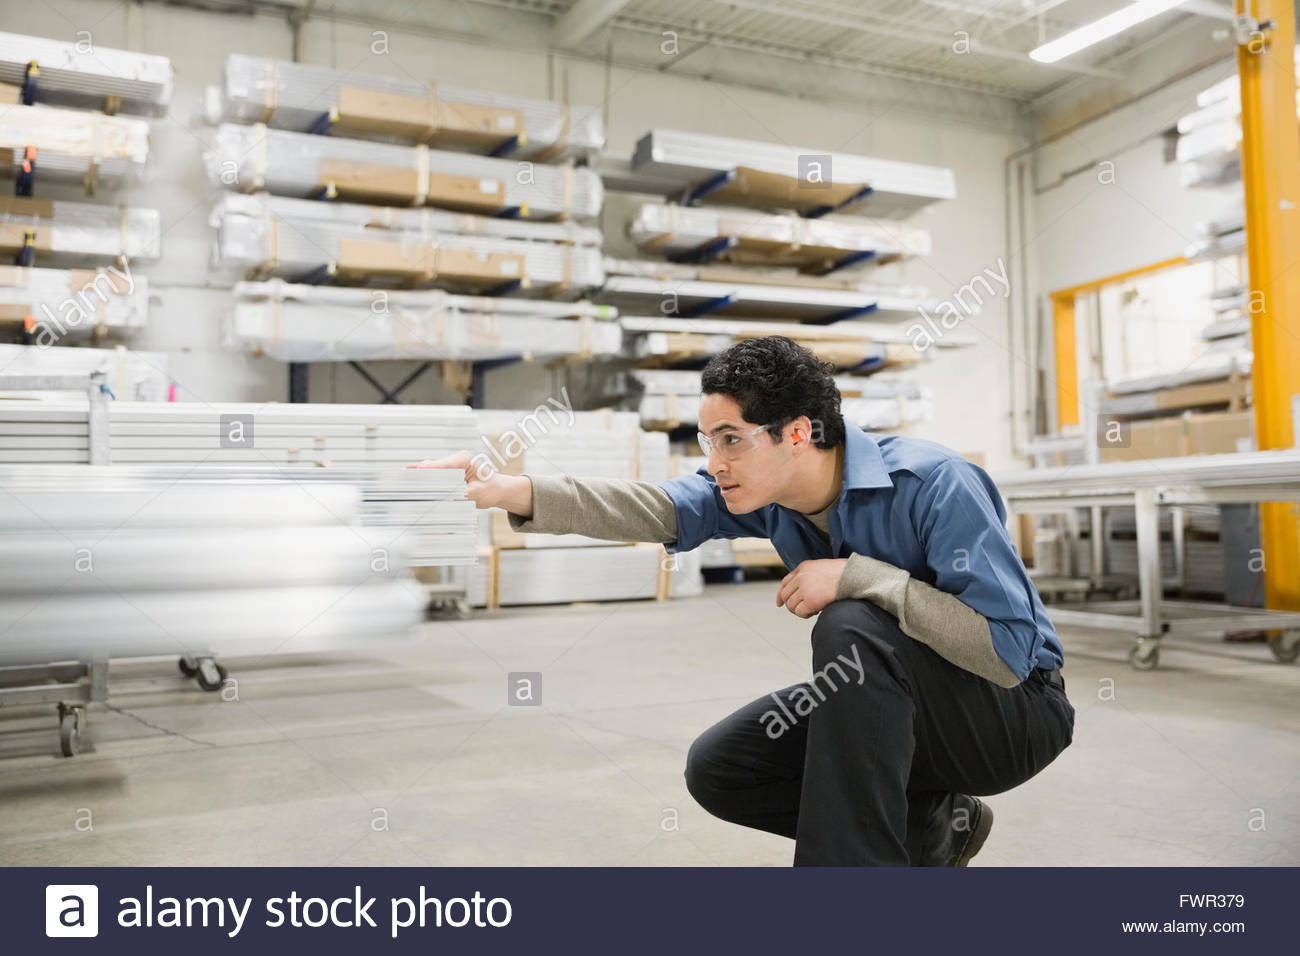 Worker examining metal in warehouse Stock Photo